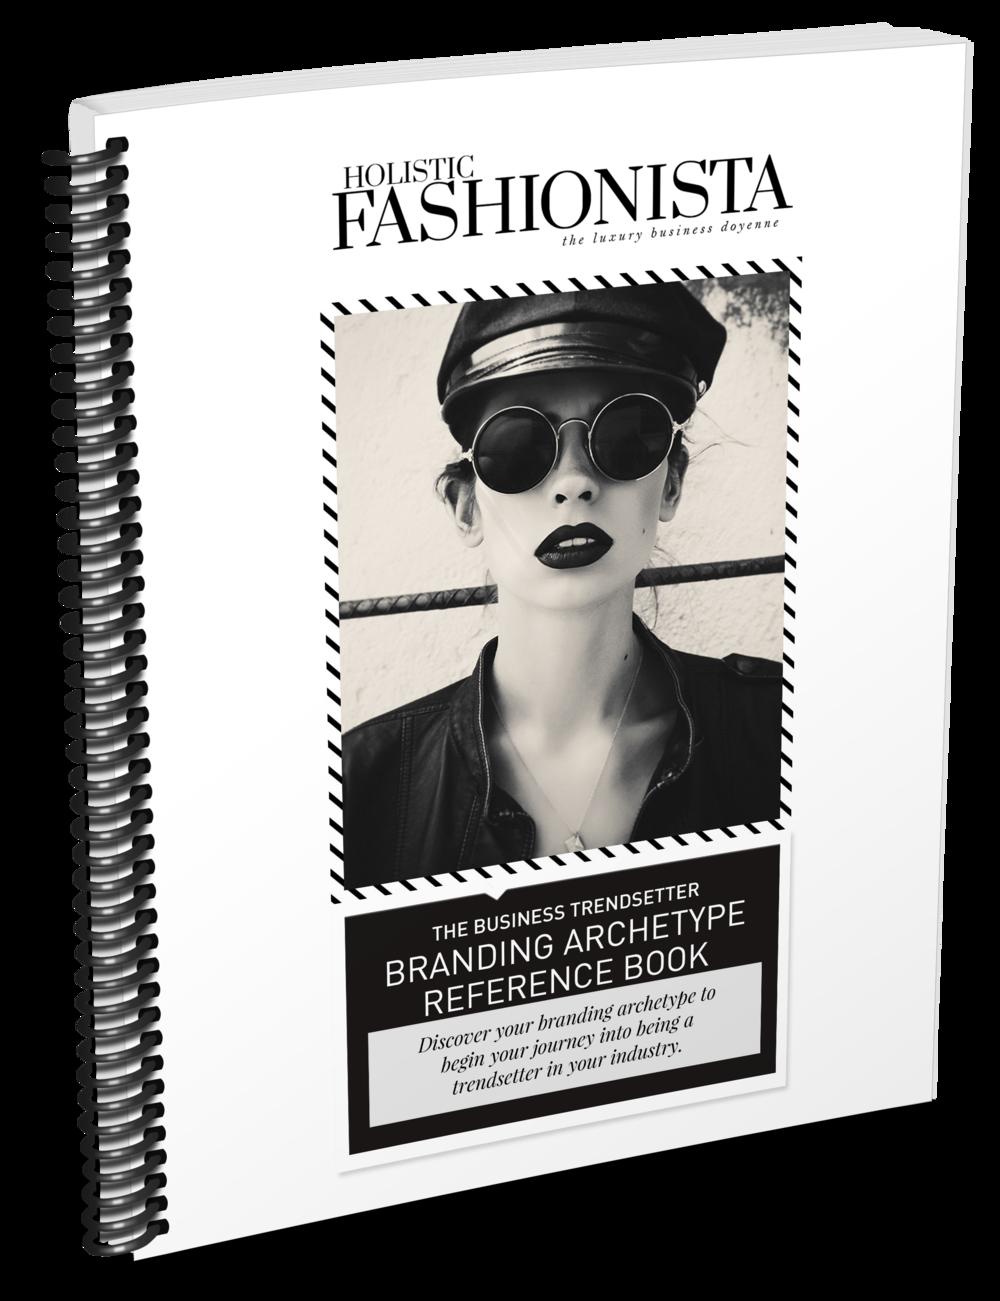 branding-archetypes